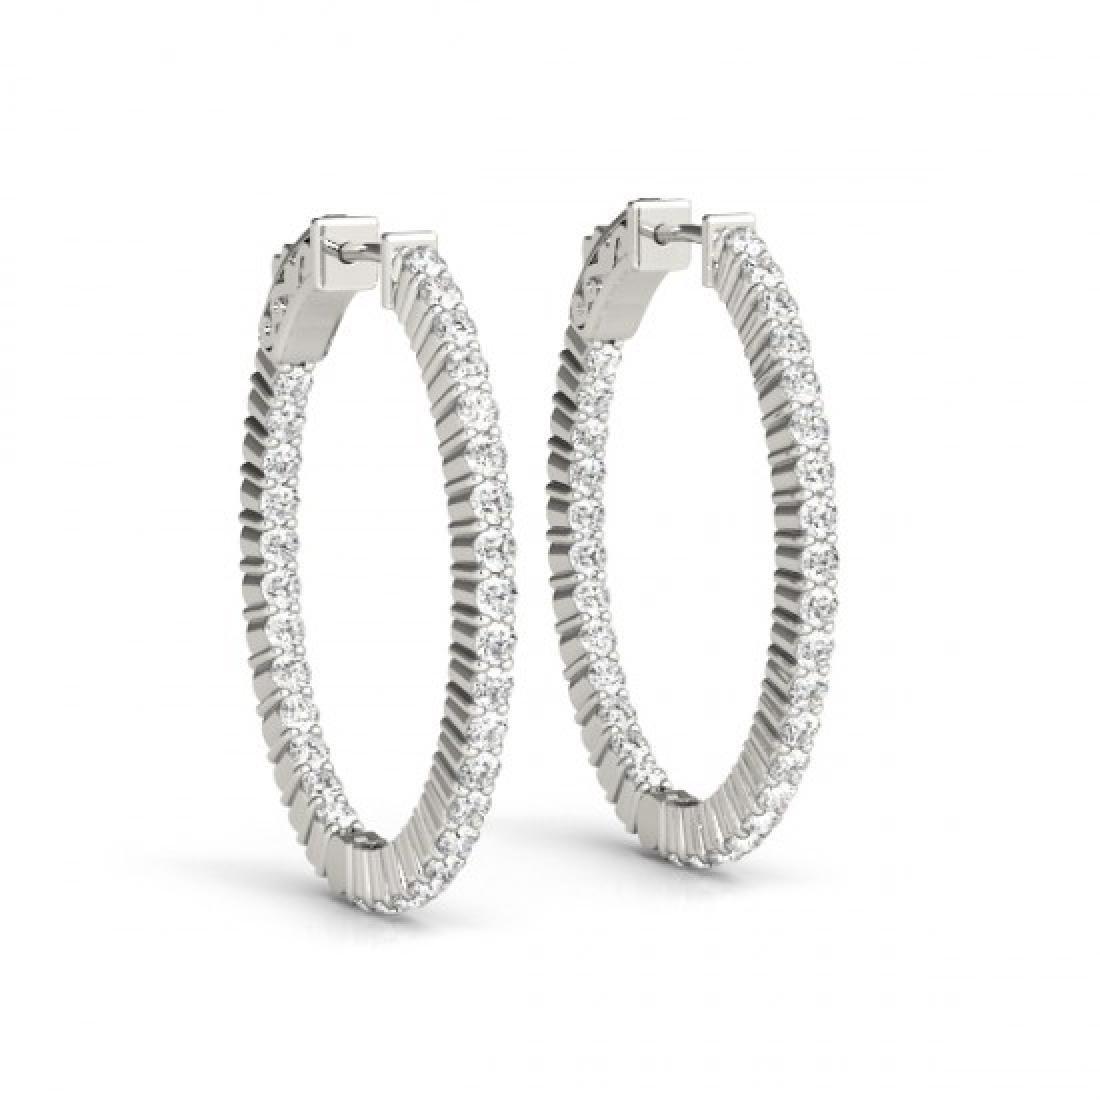 5.5 CTW Diamond VS/SI Certified 22 Mm Hoop Earrings 14K - 2